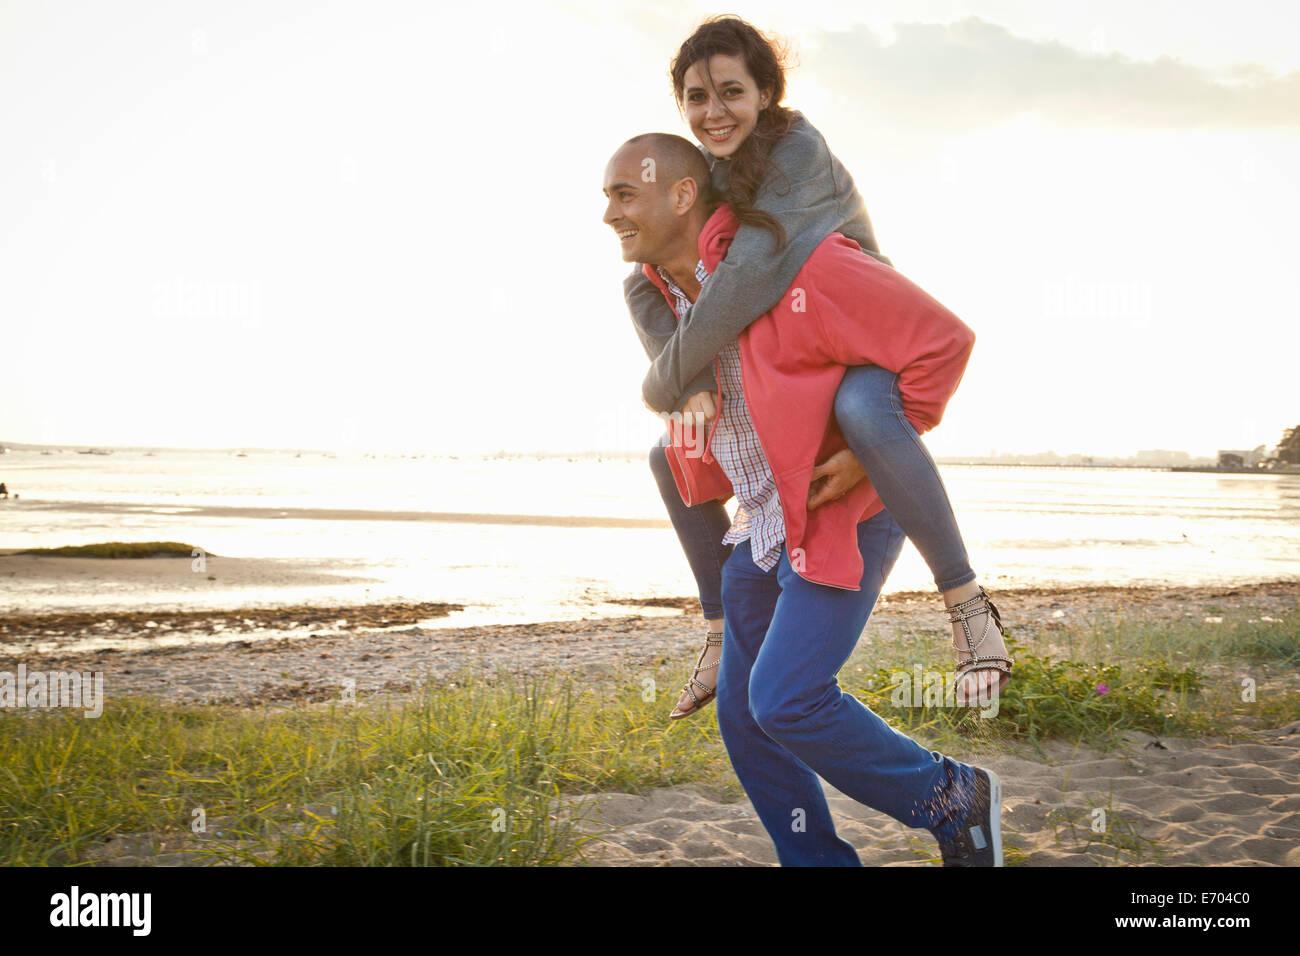 Man giving piggyback ride to woman on beach - Stock Image